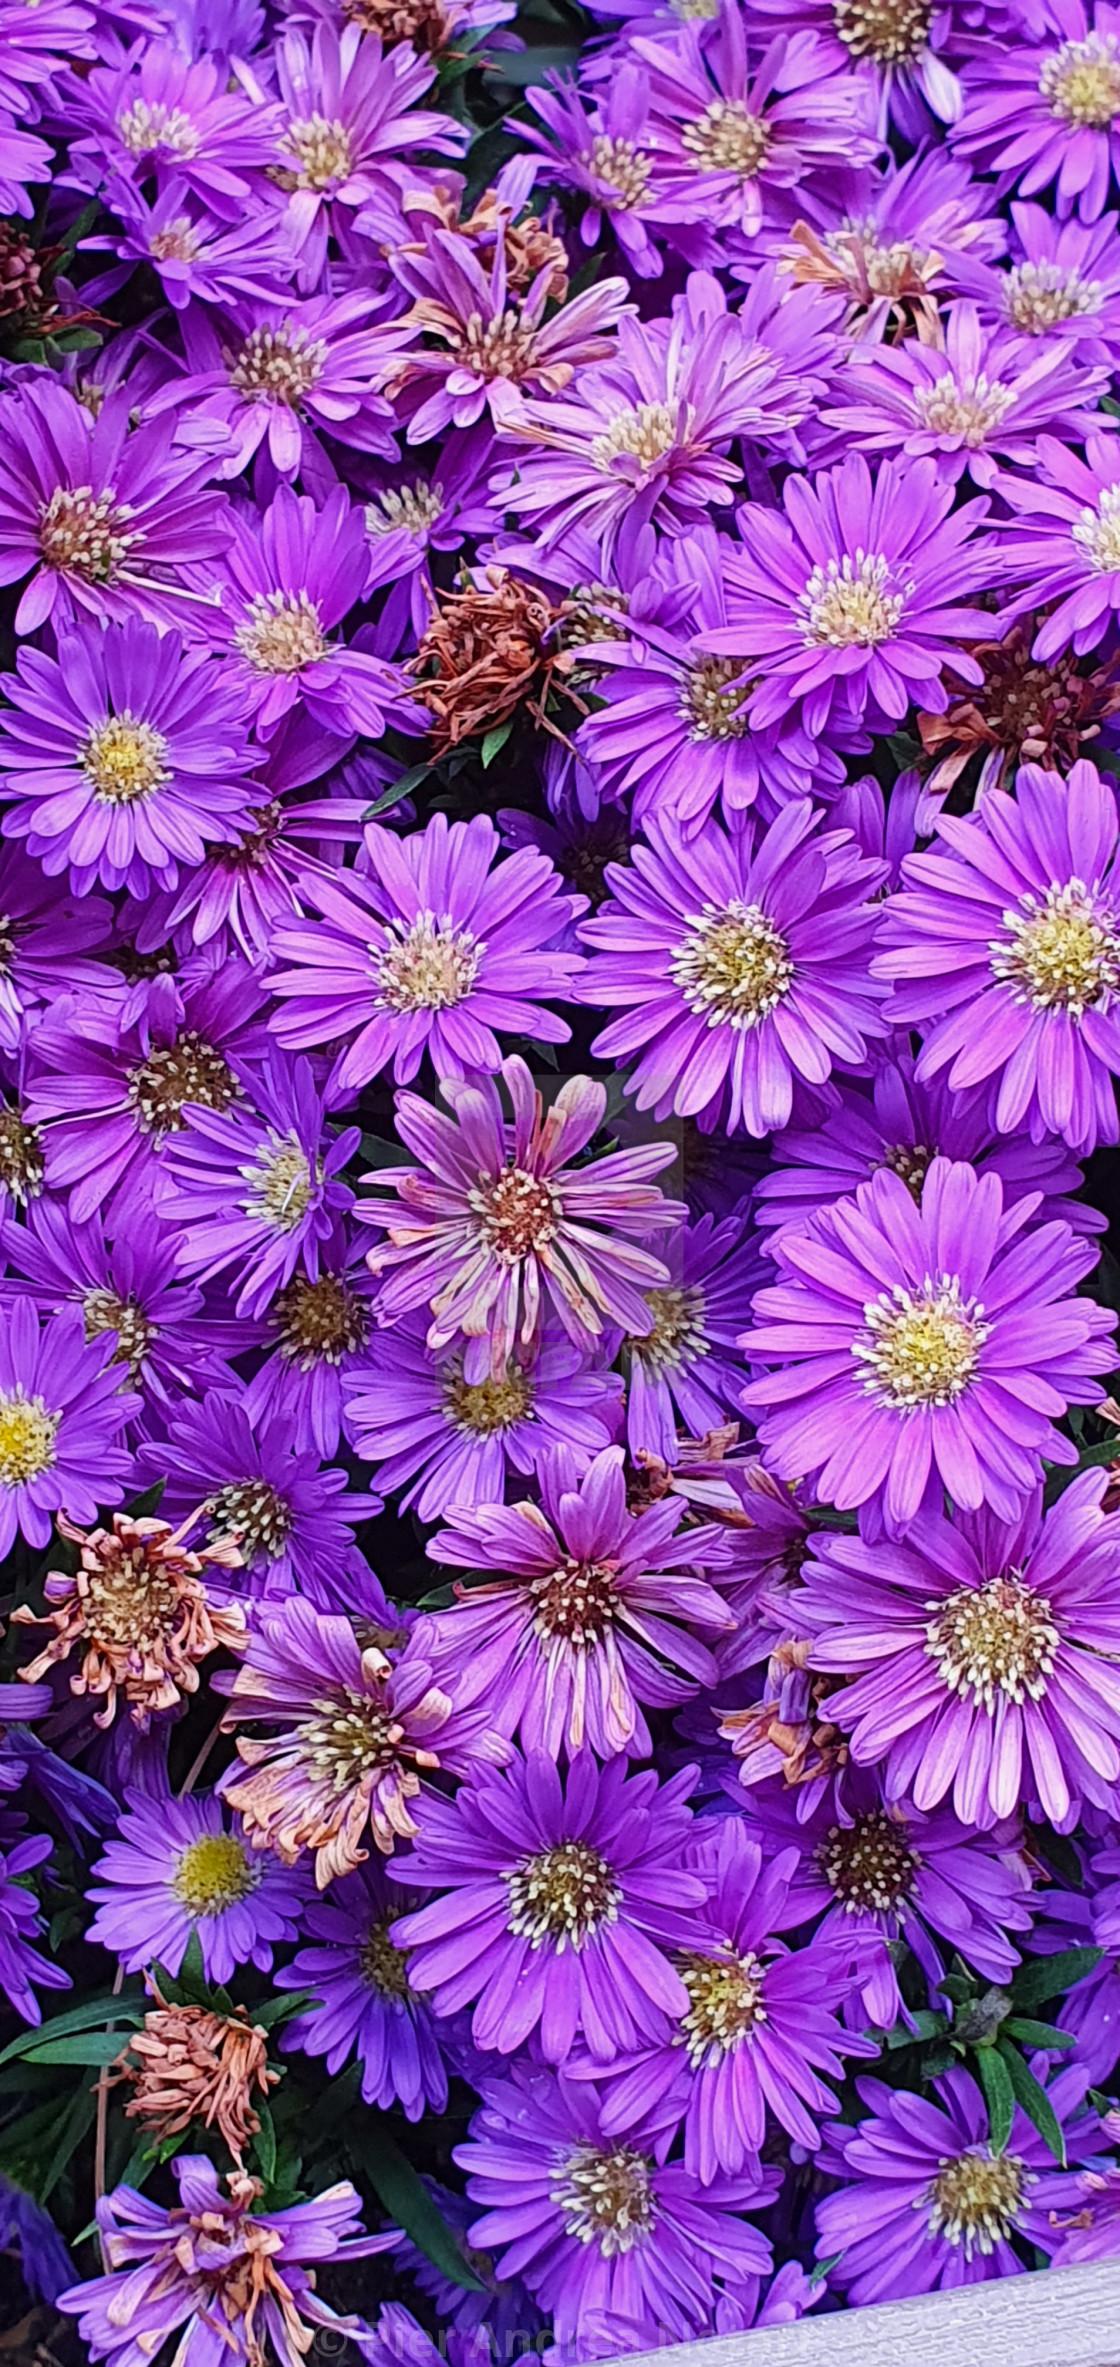 """Purple flowers close up"" stock image"